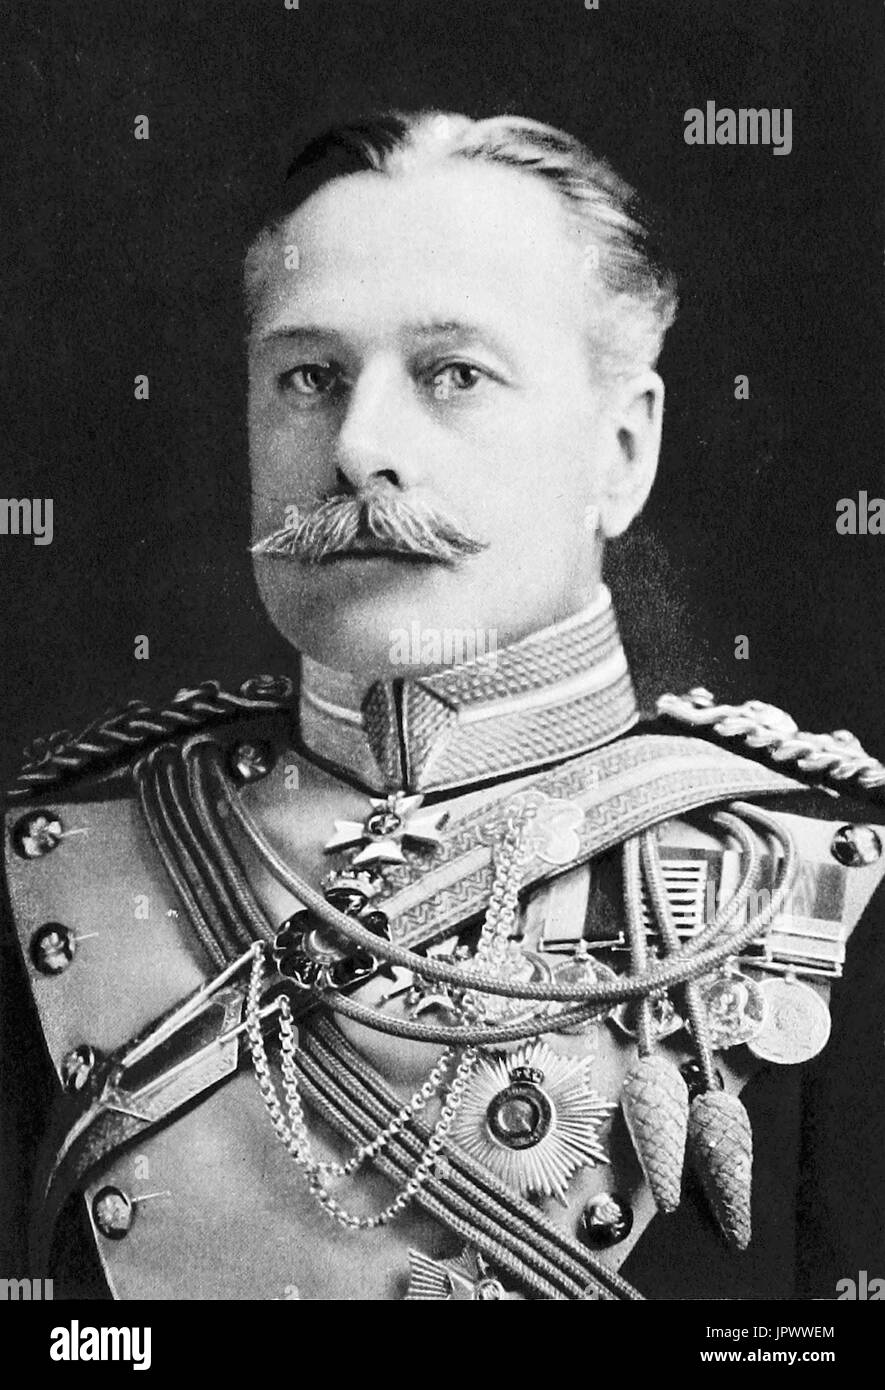 DOUGLAS HAIG, 1st Earl Haig (1861-1928) British Army commander in 1917. Photo: Elliot & Fry - Stock Image